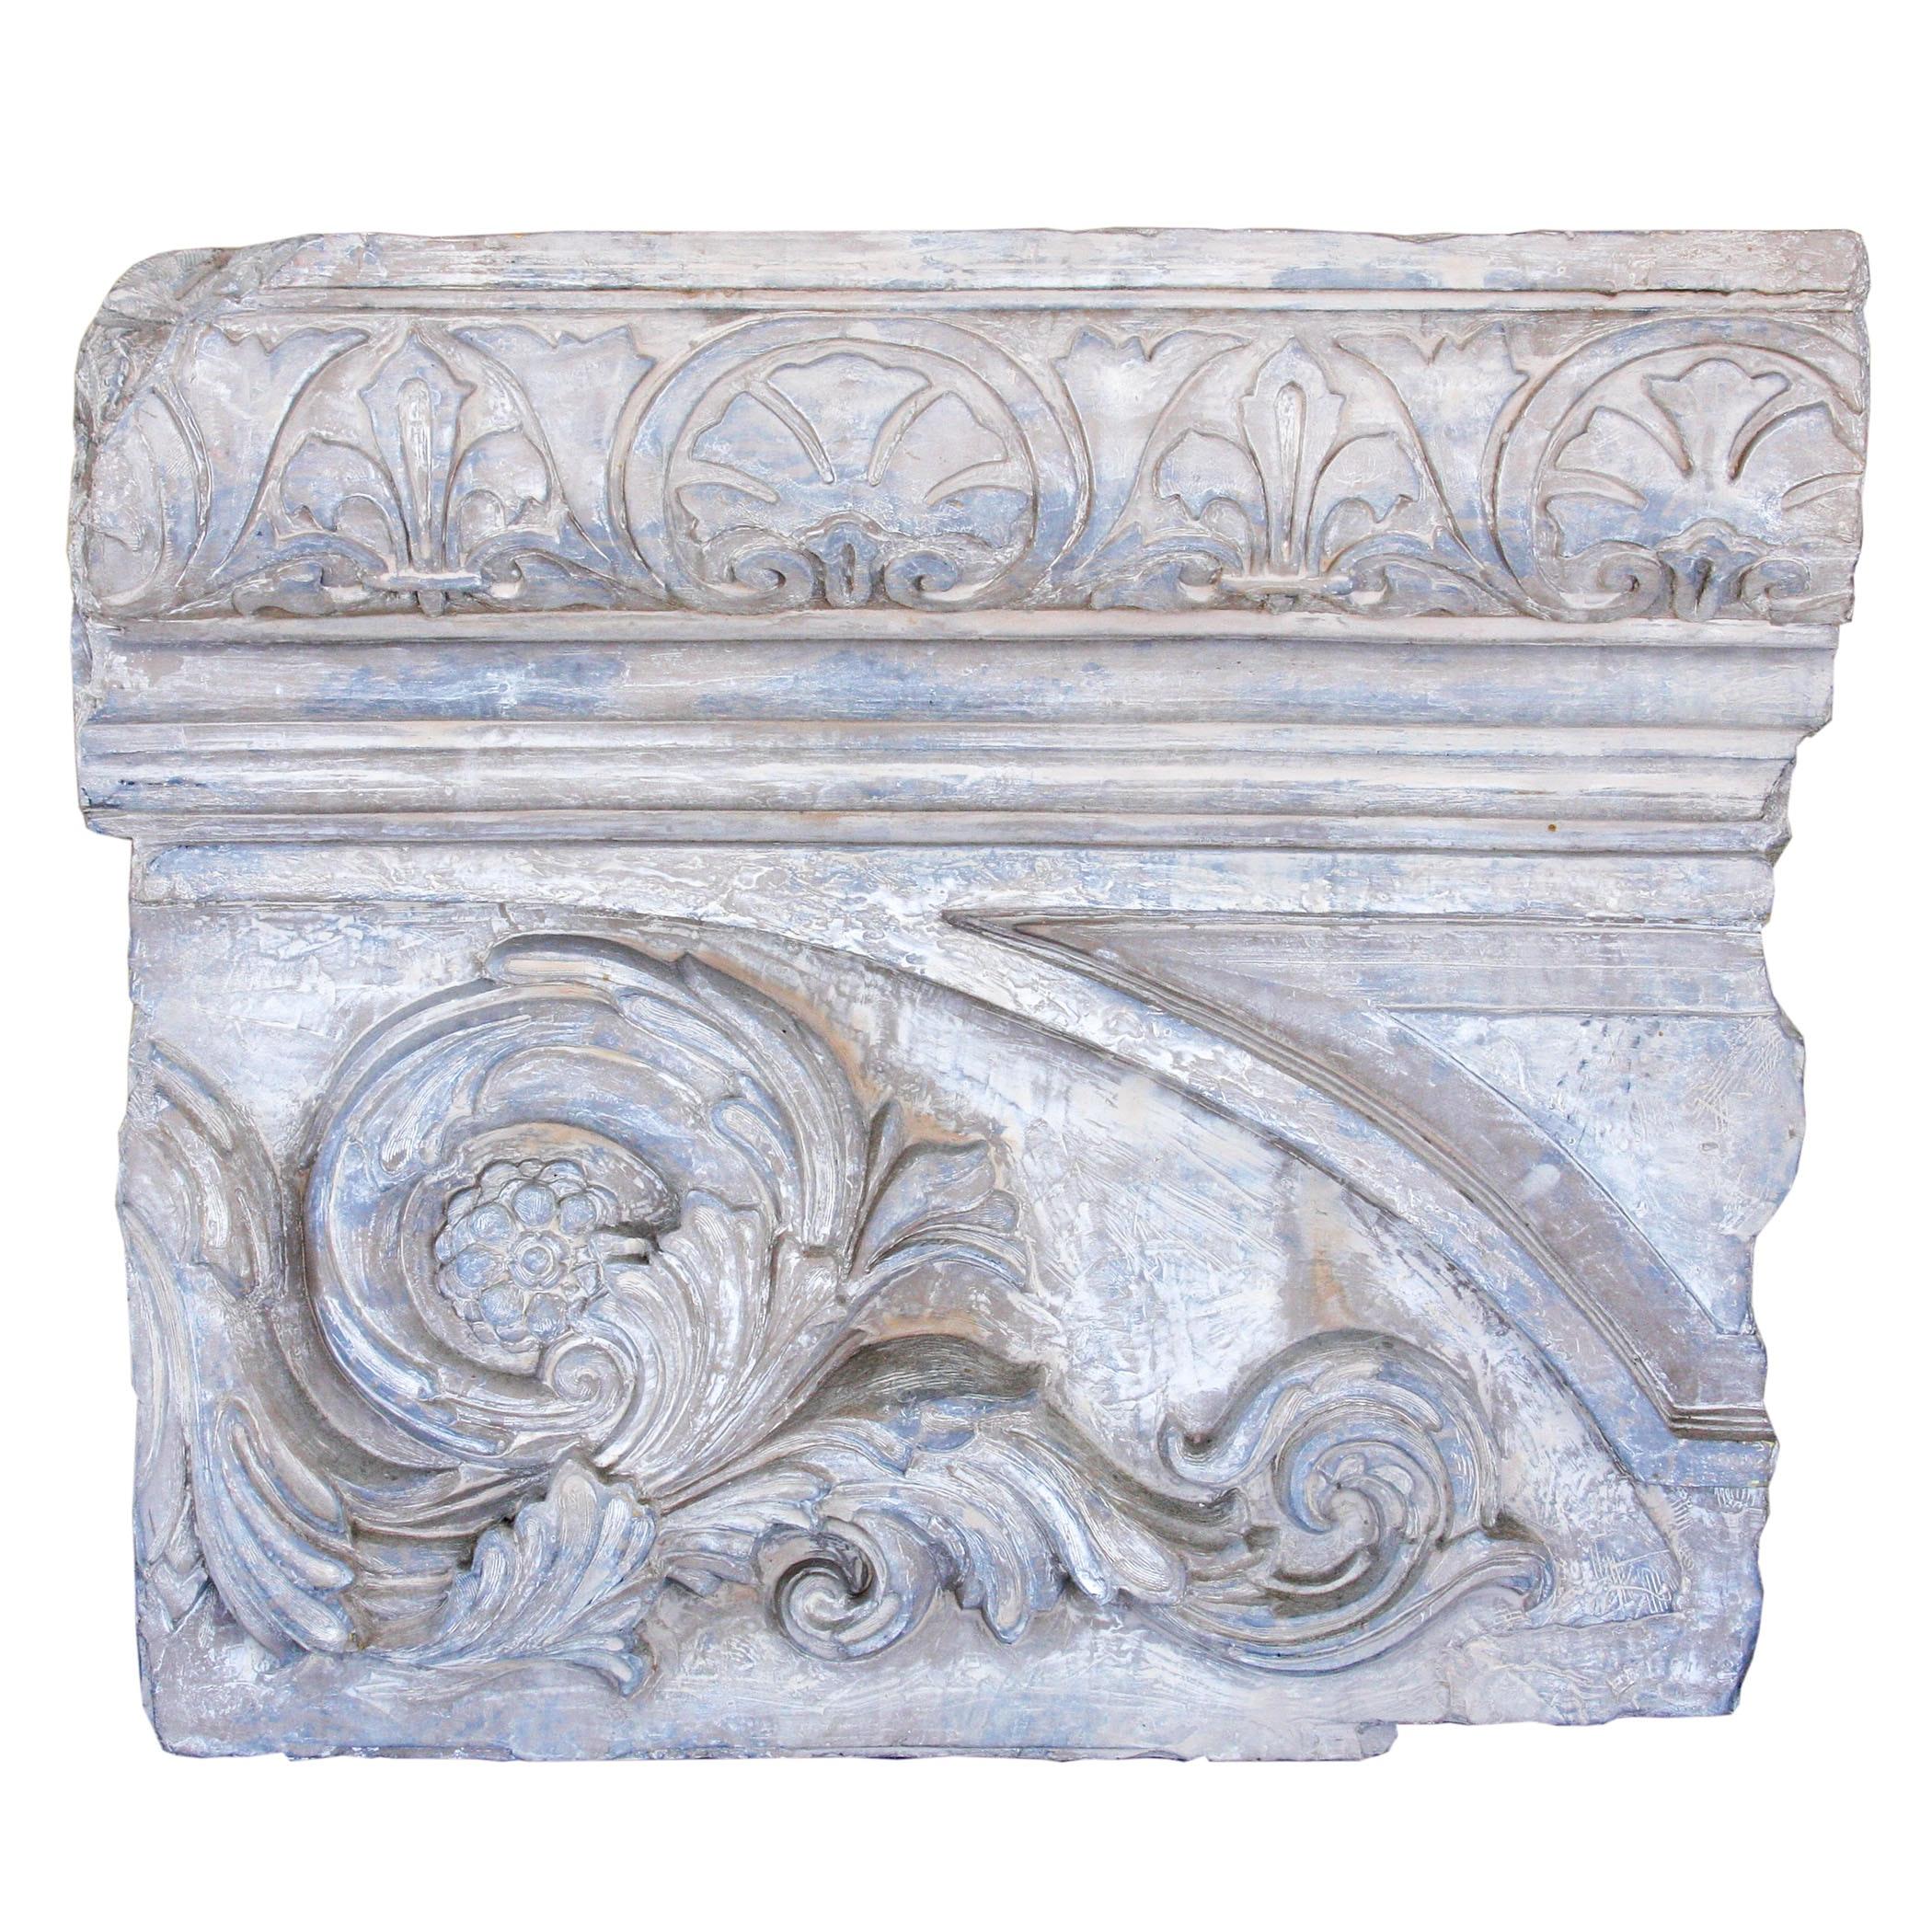 Faux Marble Wall Art